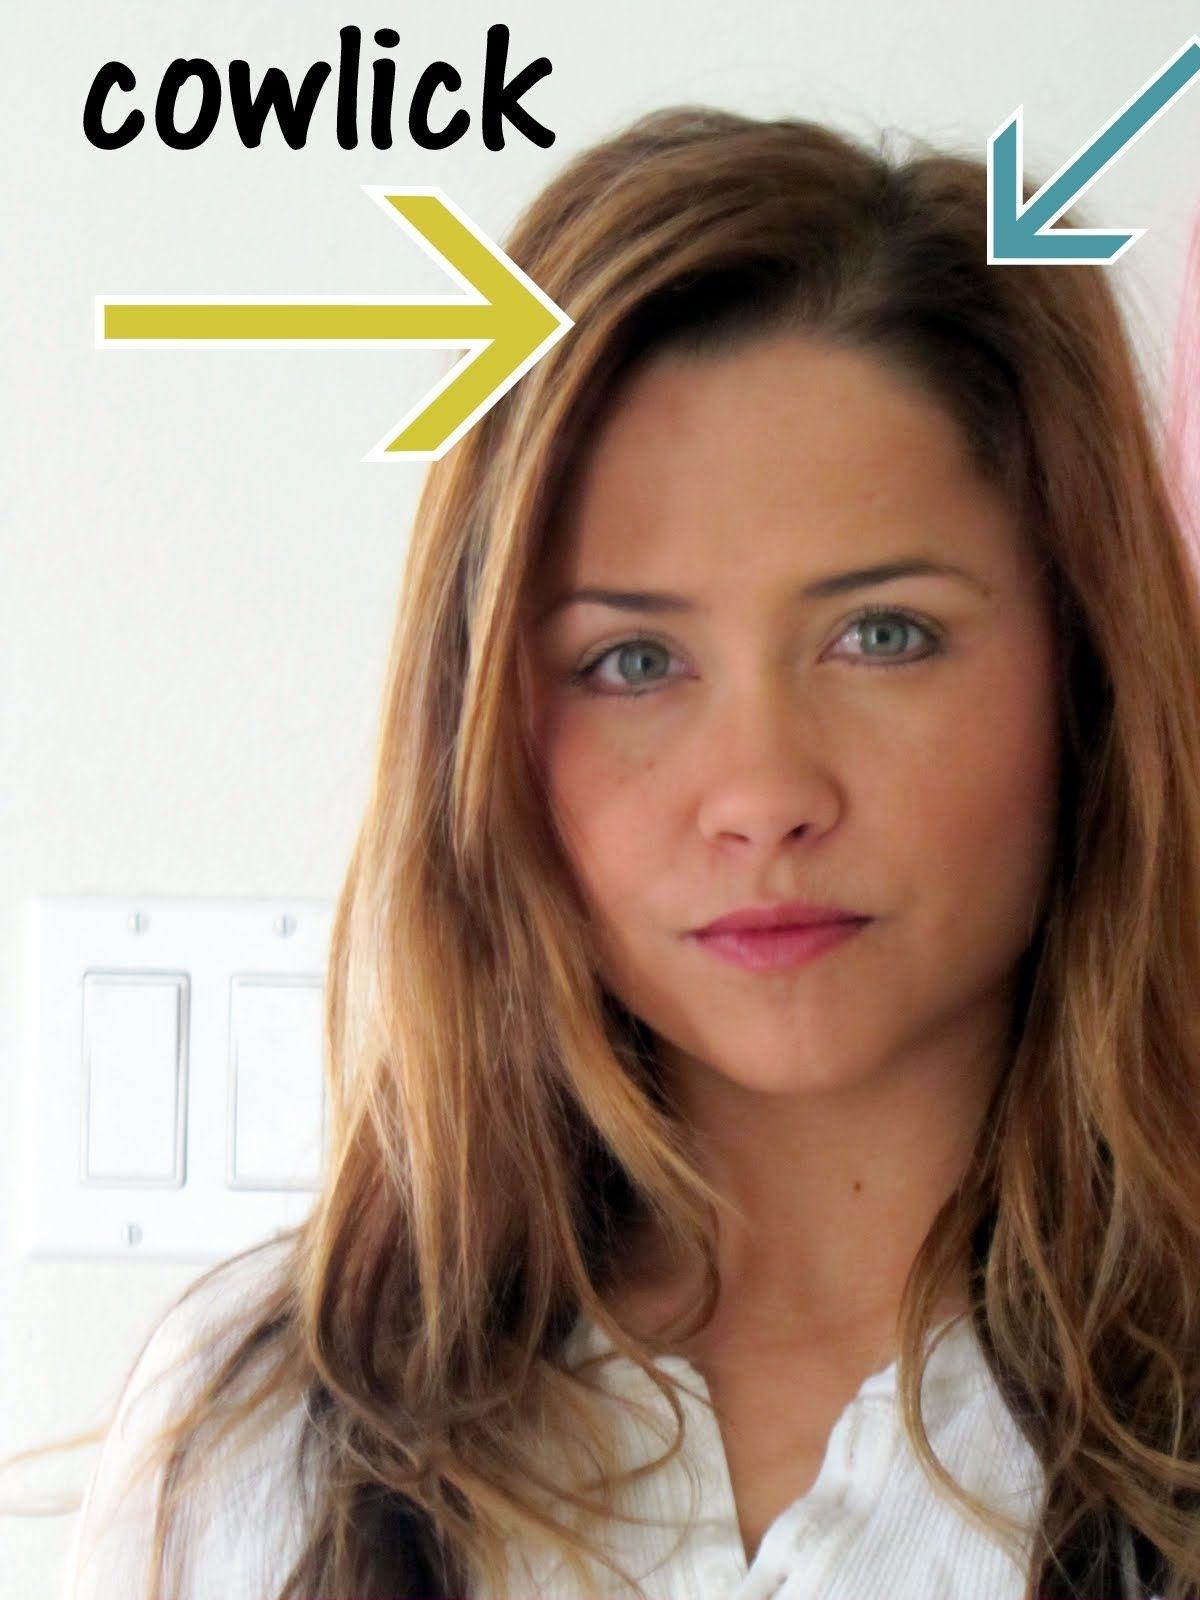 How To Hair Cut Women With Cowlick Wavy Haircut